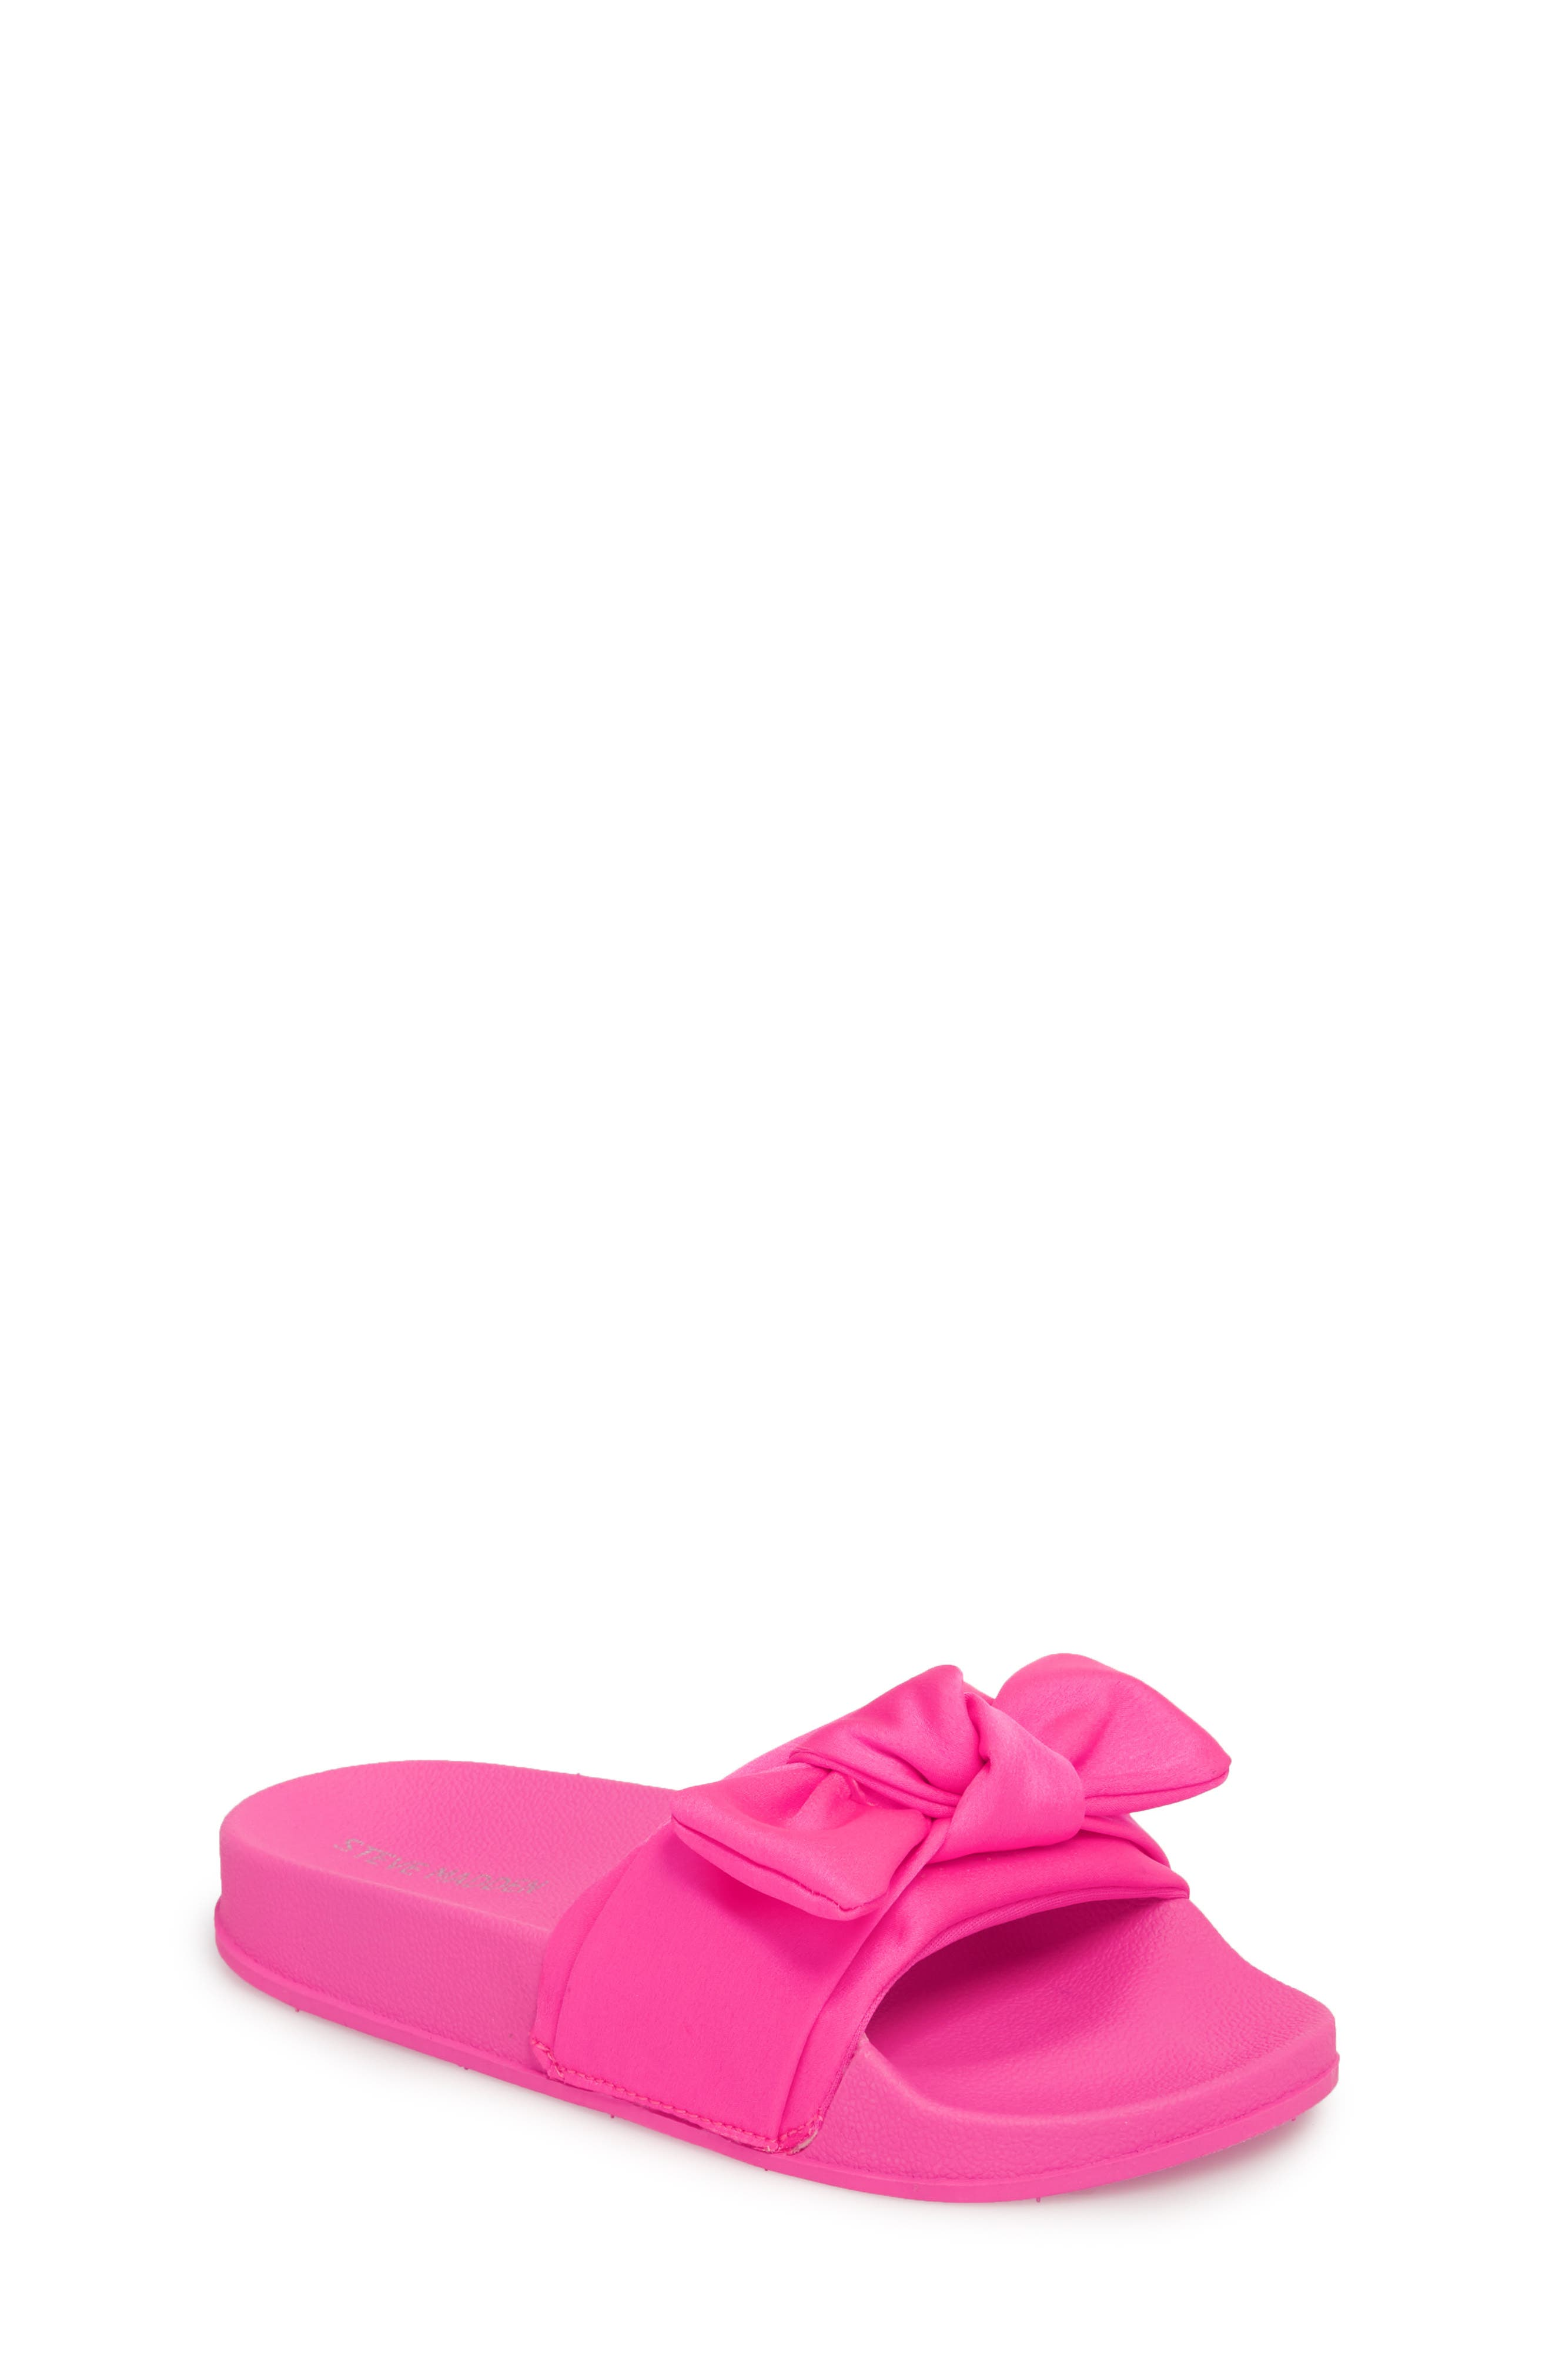 JSilky Slide Sandal,                             Main thumbnail 1, color,                             Hot Pink